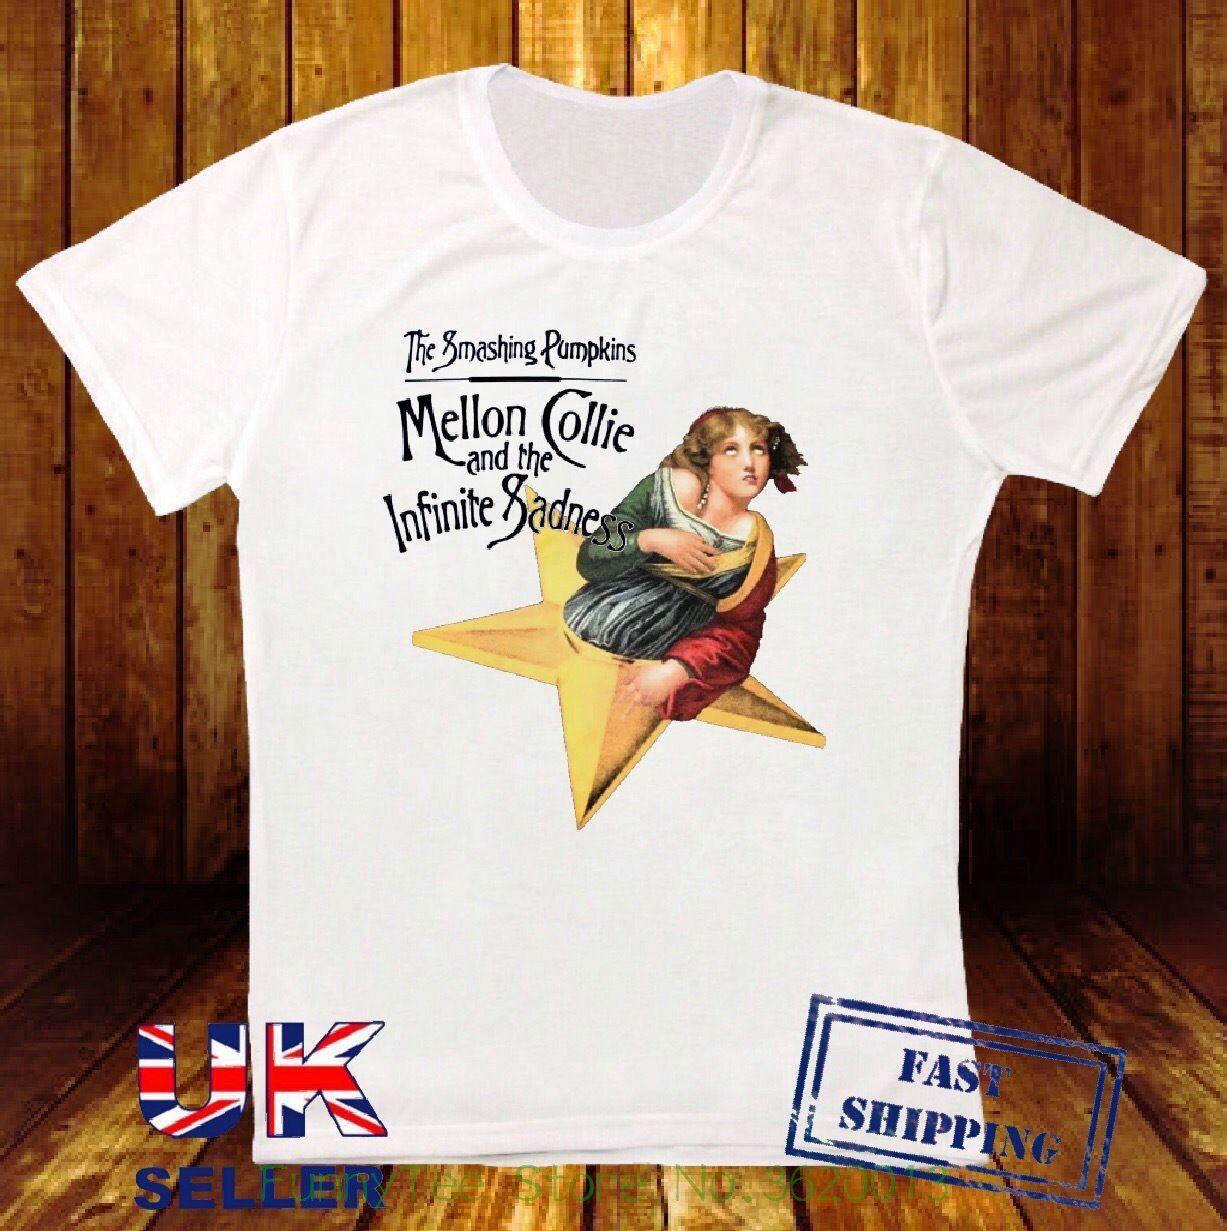 7dcf15450d7 The Smashing Pumpkins Mellon Collie Et Le Infinite Sadness Blanc T Shirt  192 It T Shirt Design Clever Tee Shirts From Aaa888teesstore